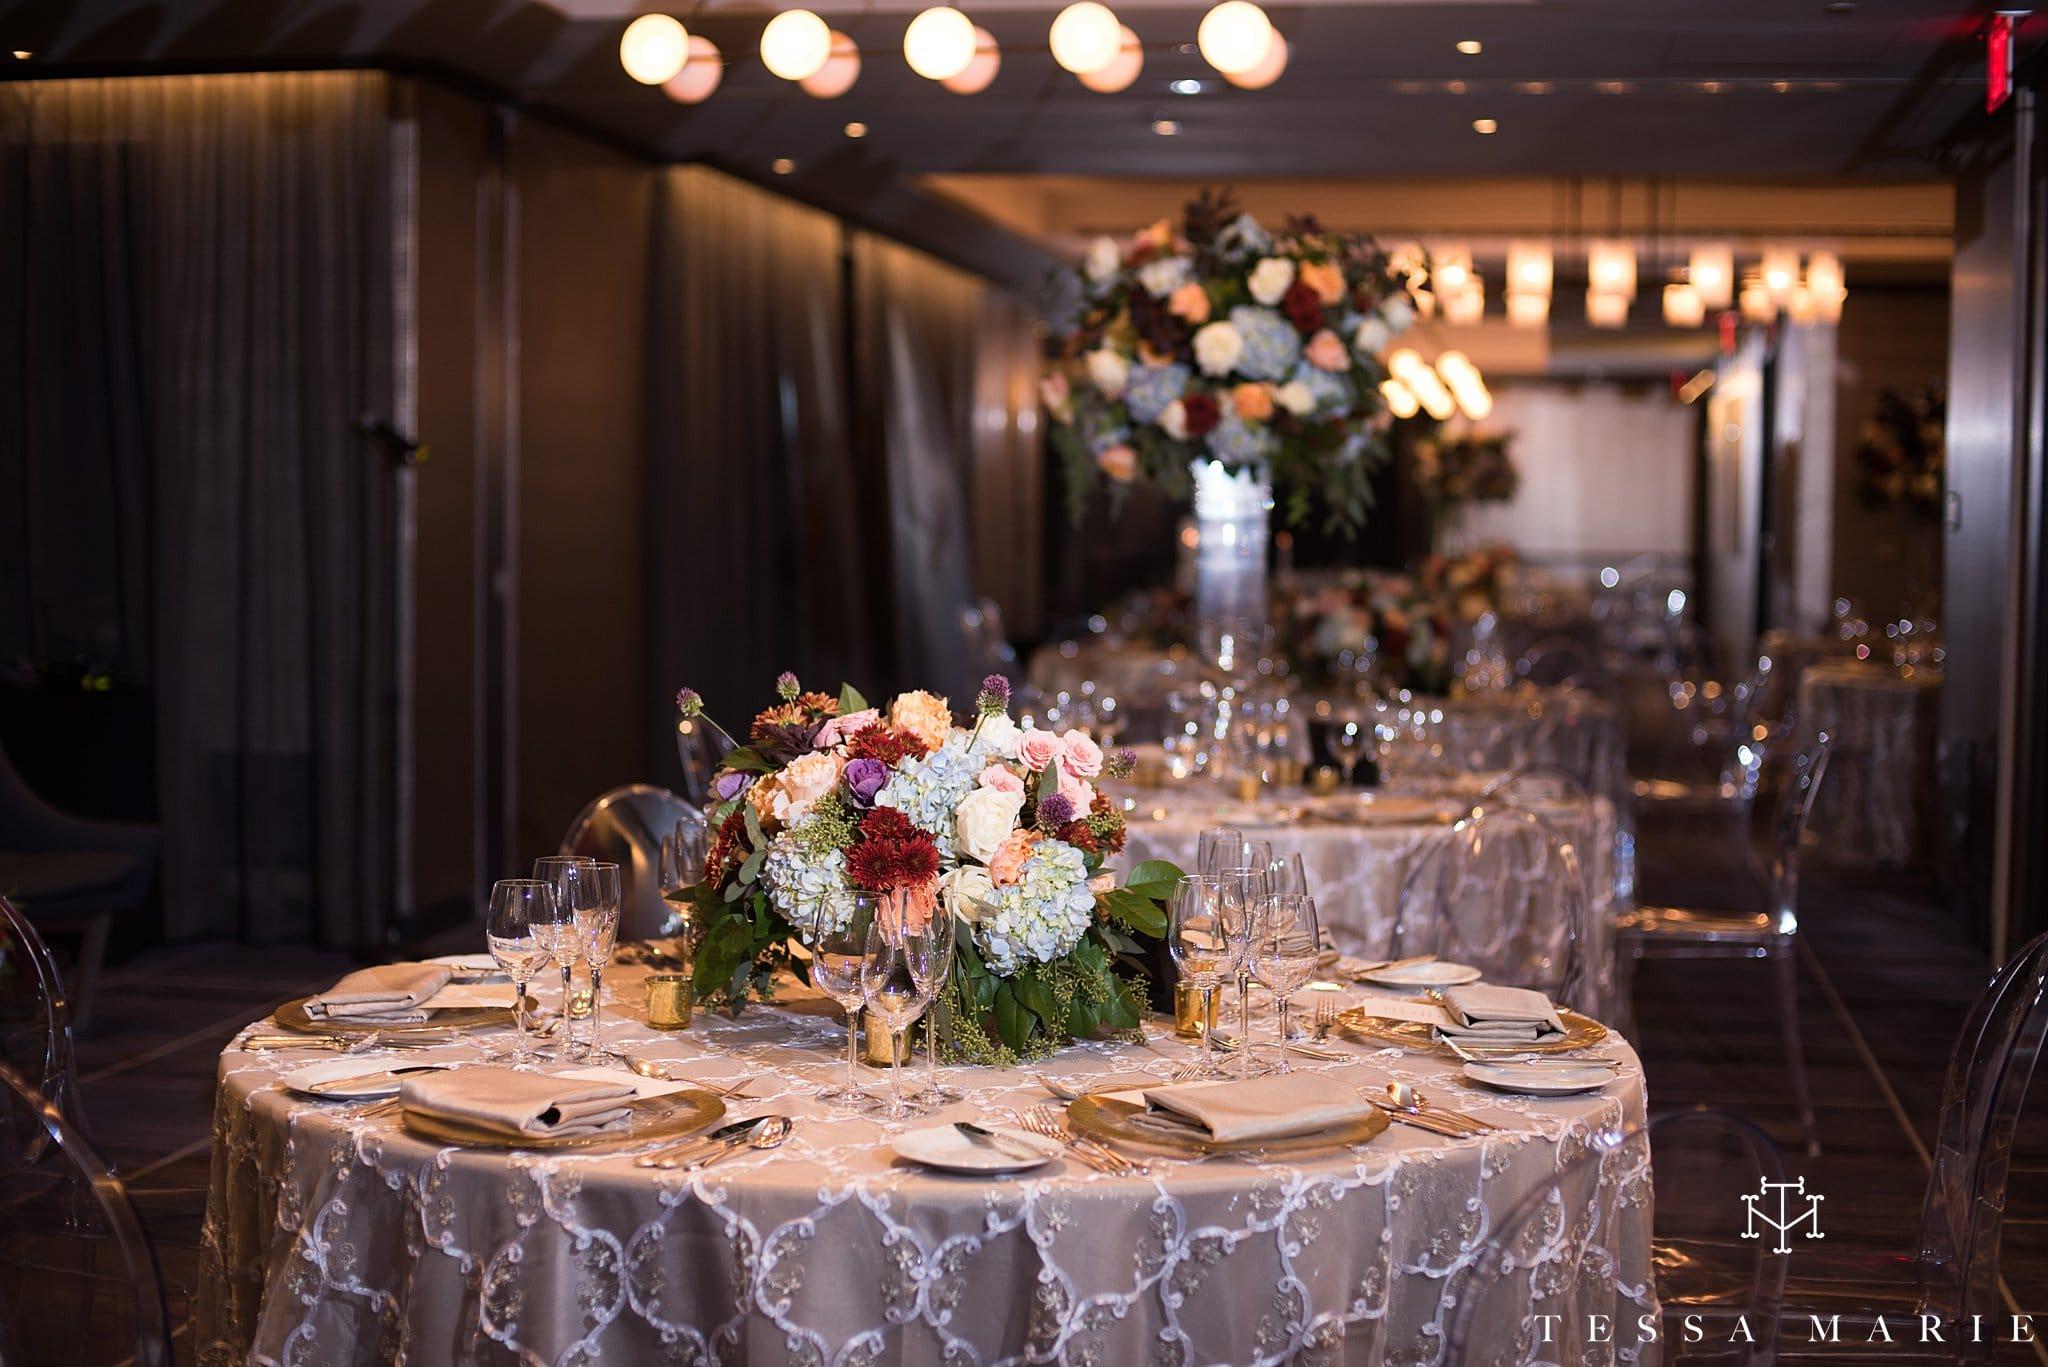 tessa_marie_Weddings_four_seasons_rehersal_dinner_pictures_wedding_atlanta_wedding_getting_married_0007.jpg